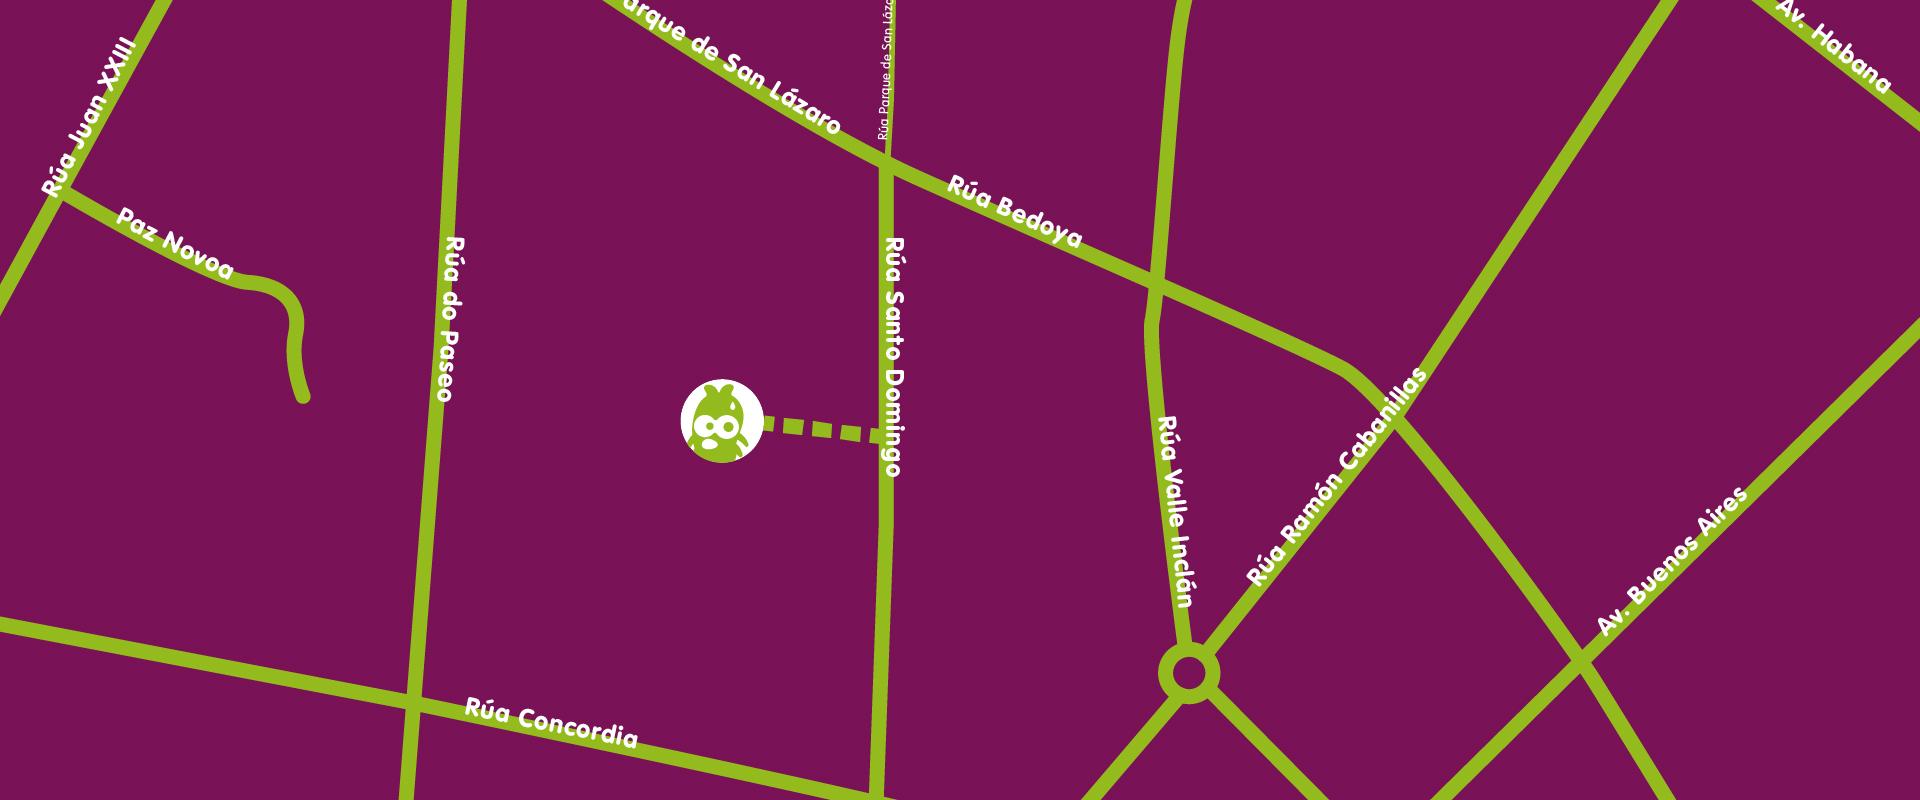 mapa-ubicacion